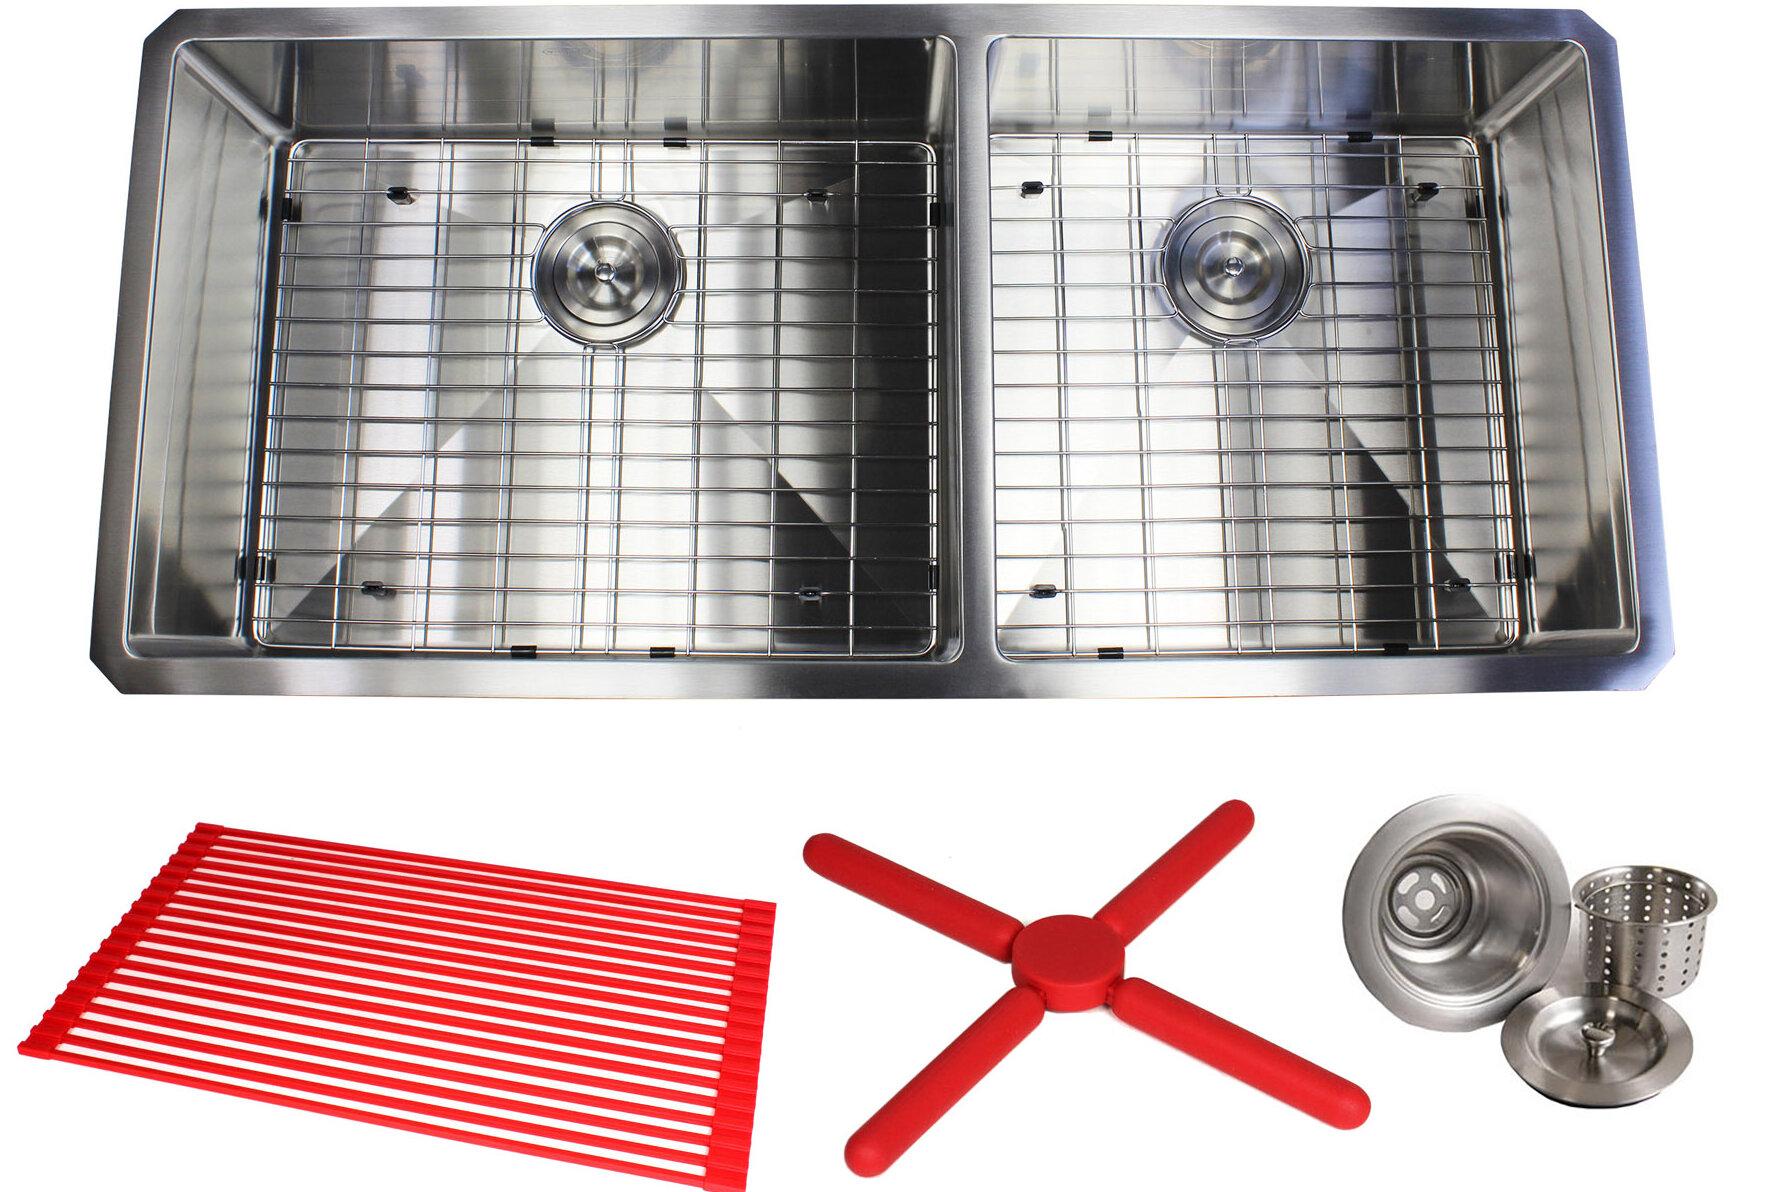 Ariel Premium Stainless Steel 42  L x 19  W Double Basin Undermount Kitchen Sink with Sink Grid and Drain Assembly | AllModern  sc 1 st  AllModern & Ariel Premium Stainless Steel 42